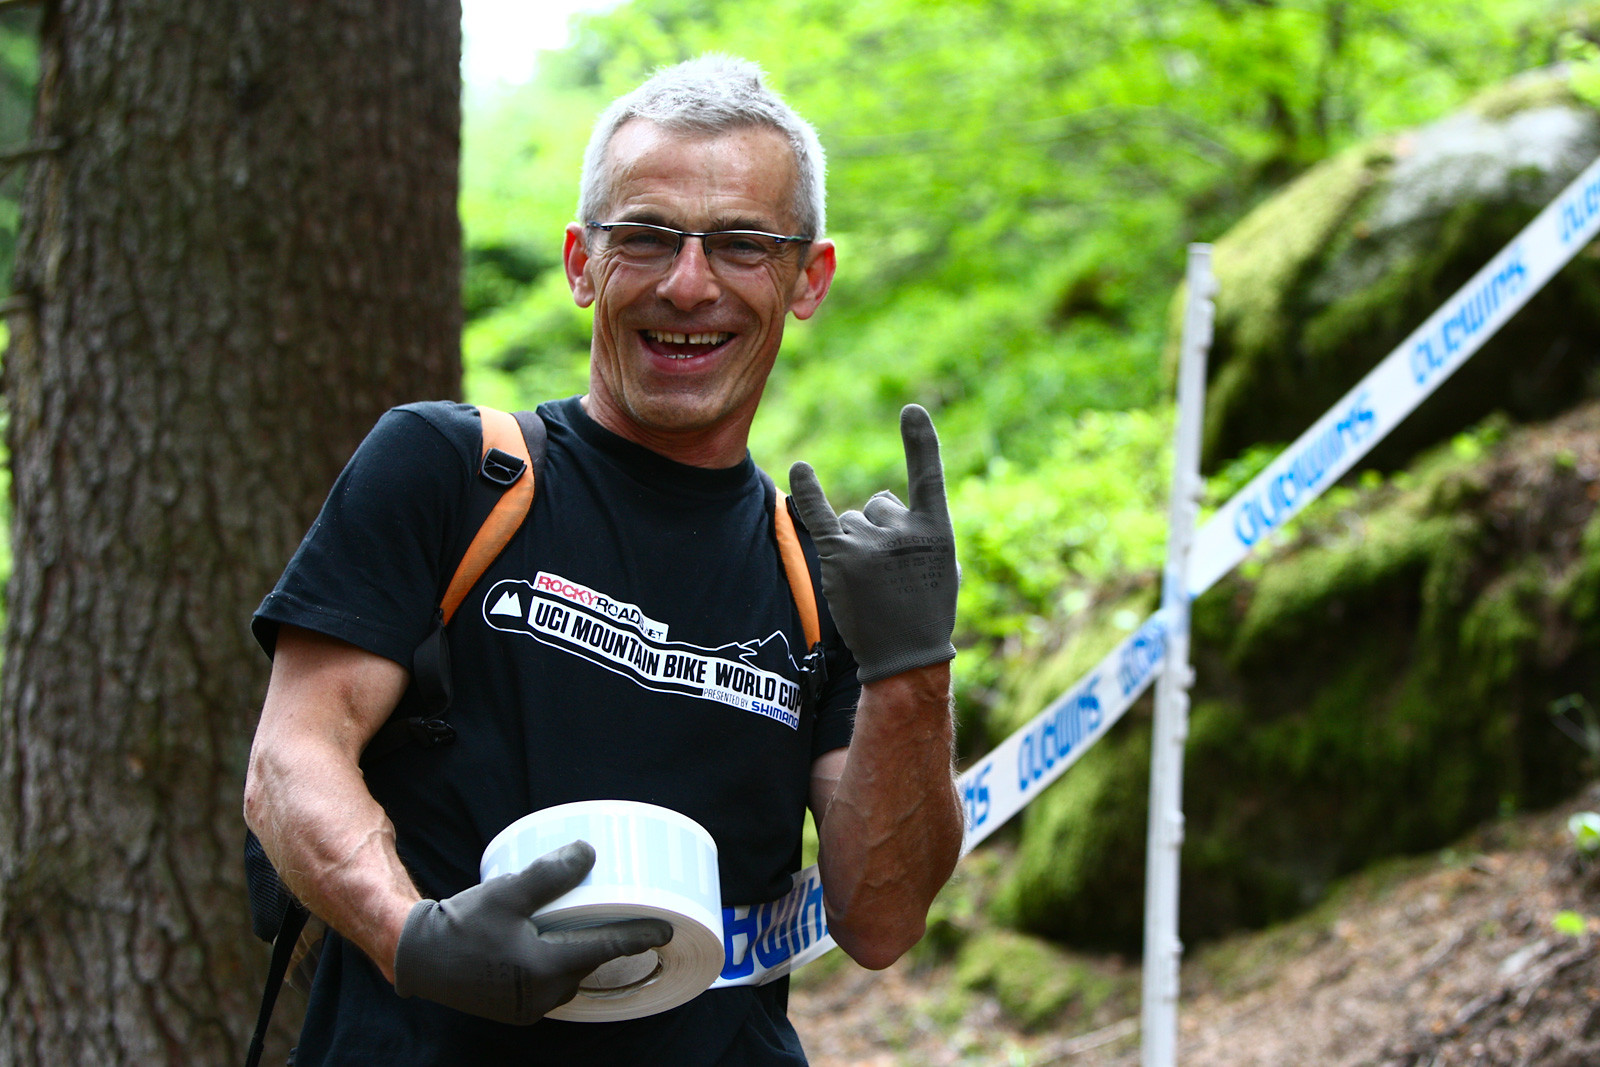 Pippo Marani - 2012 UCI World Cup, Val di Sole Day 1 - Mountain Biking Pictures - Vital MTB